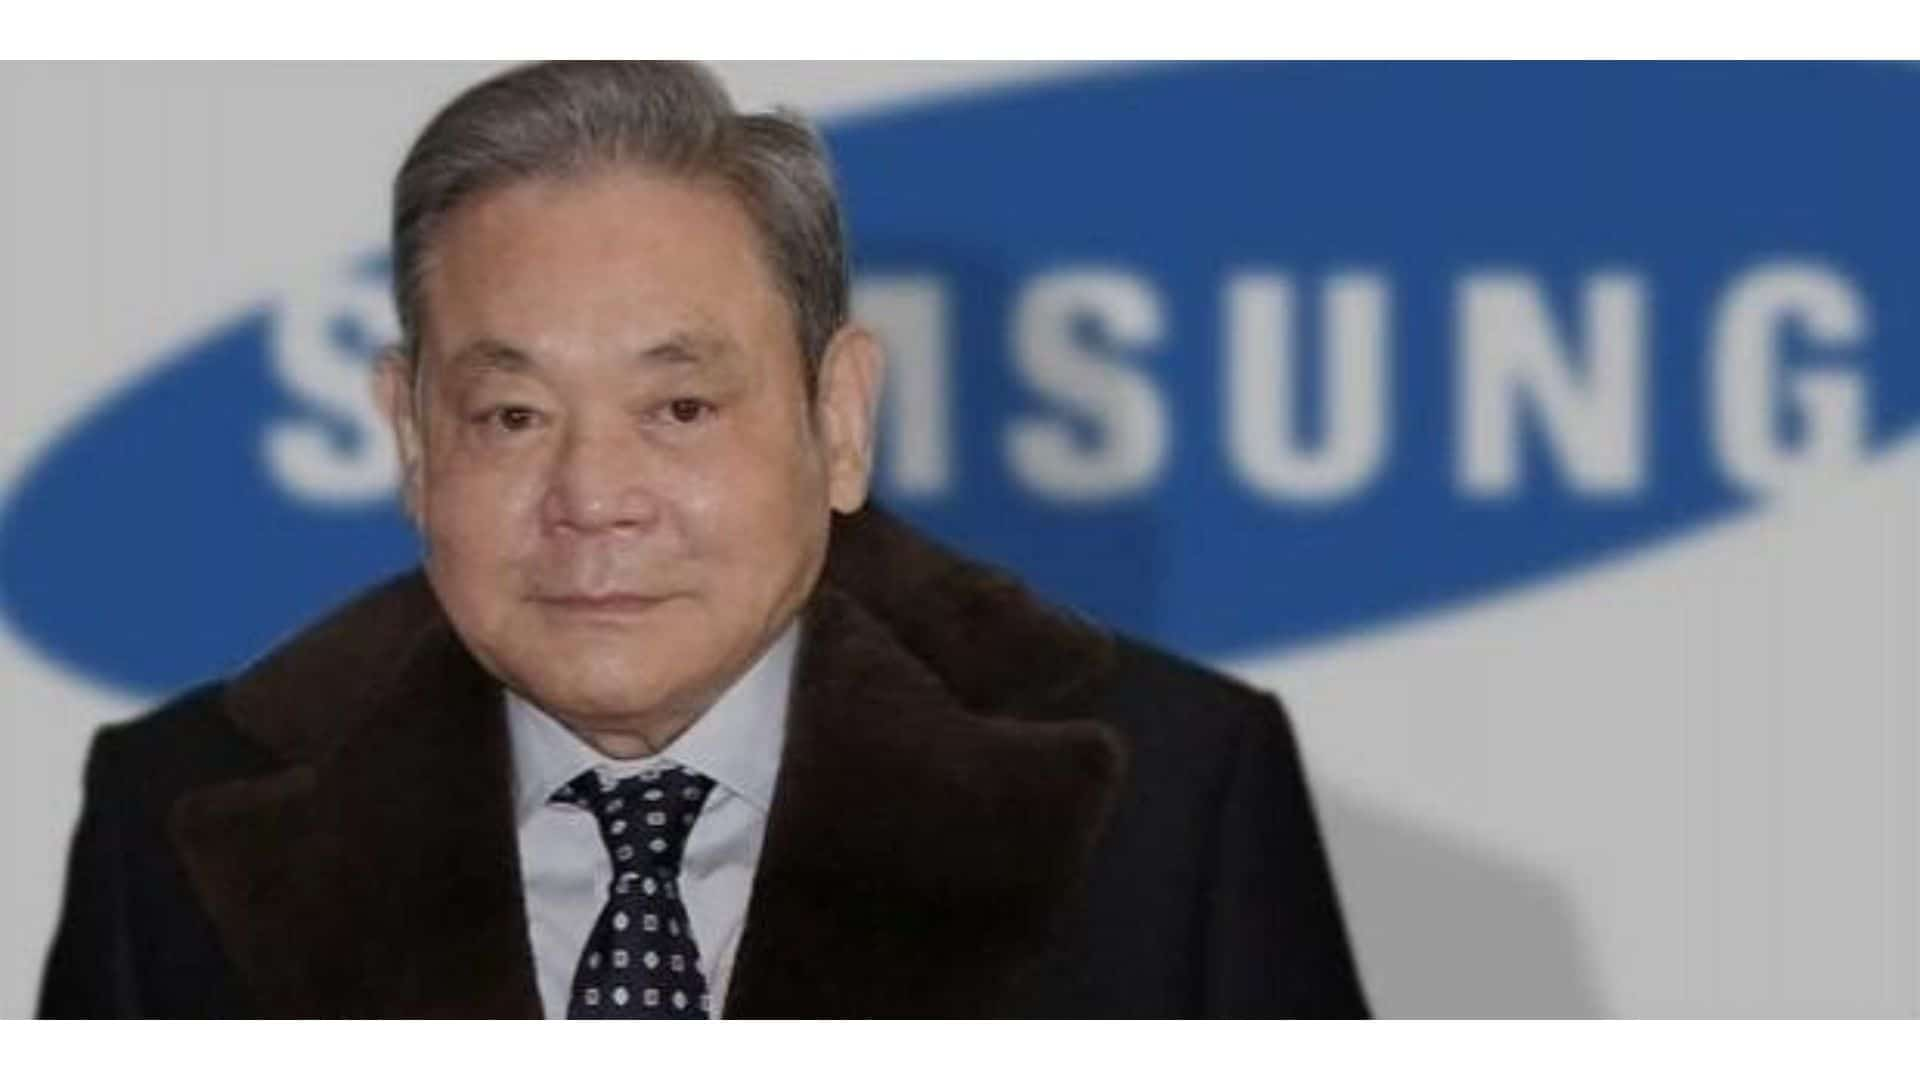 Samsung Electronics - Lee Byung-Chul